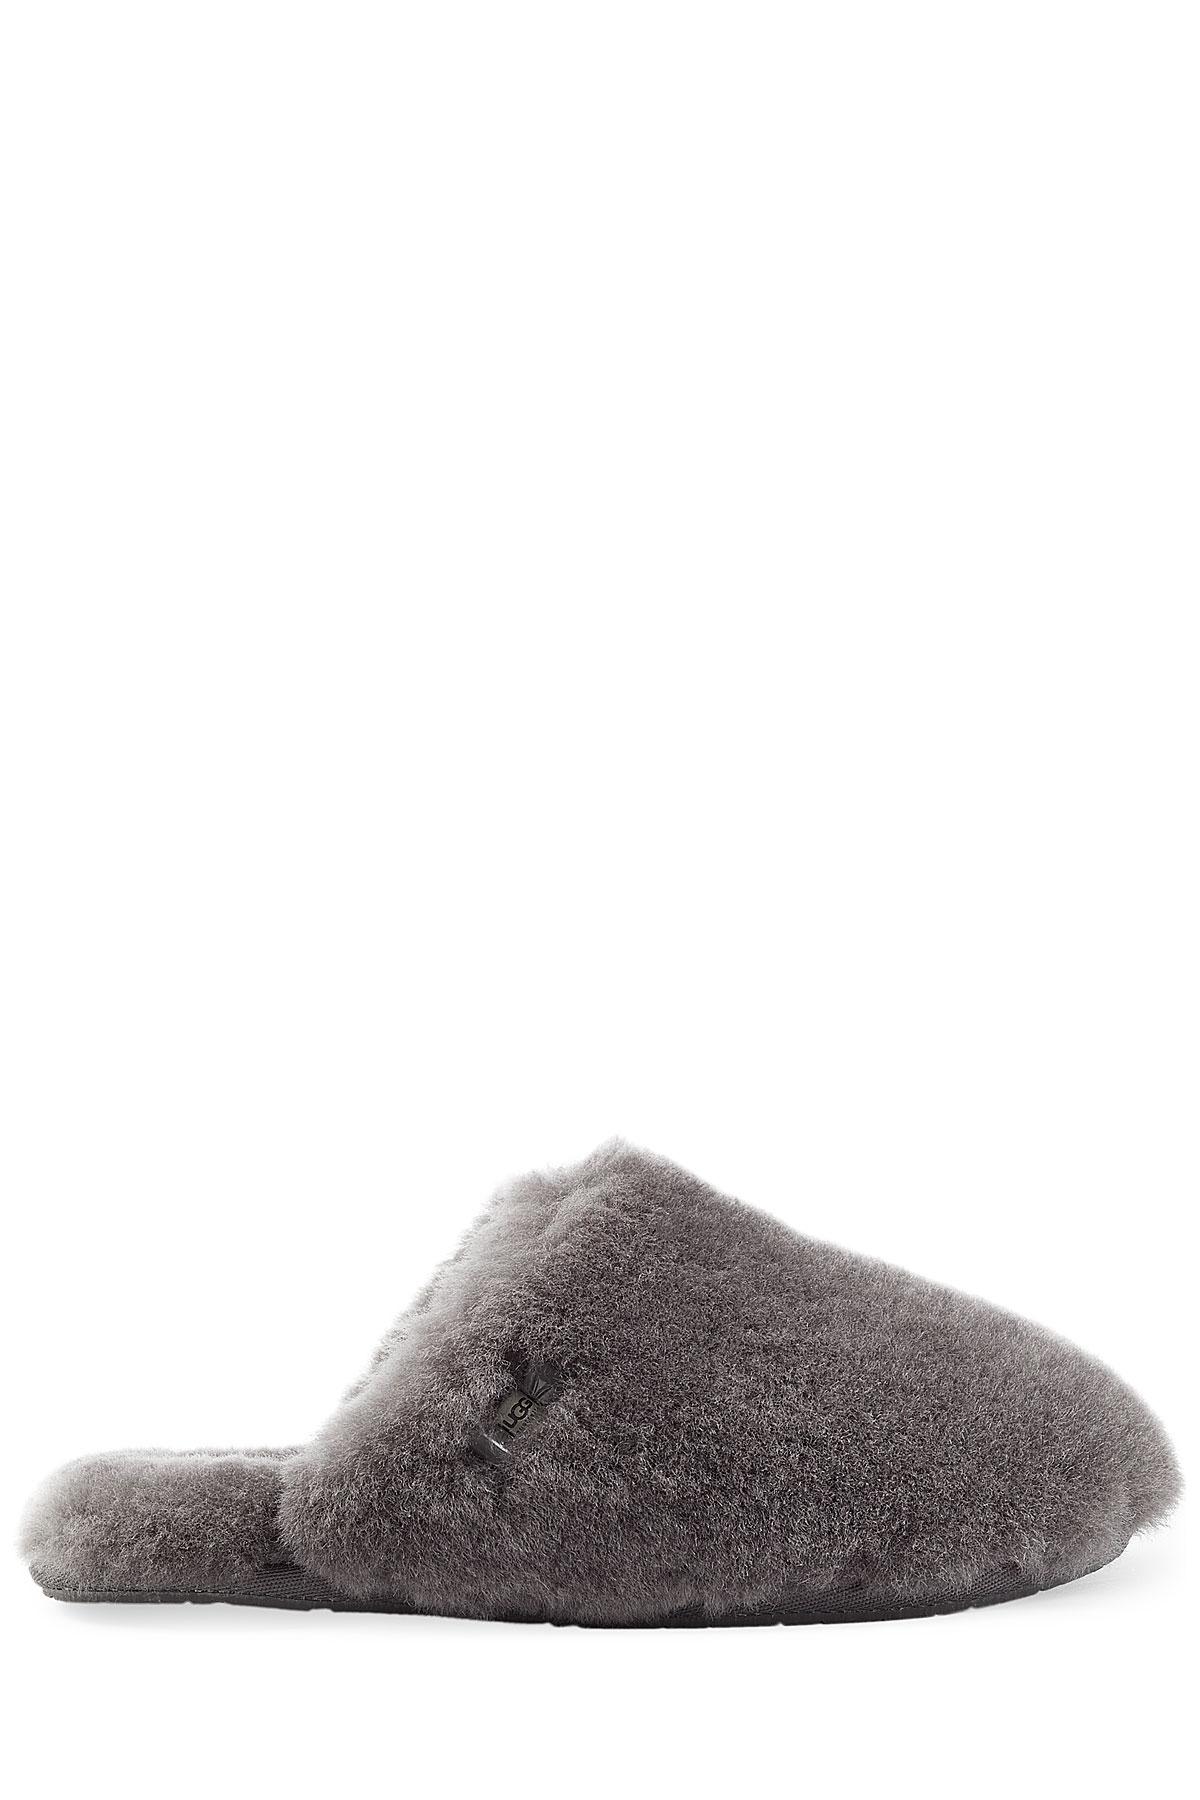 bacc6691536 UGG Gray Fluff Clog Sheepskin Slippers - Grey